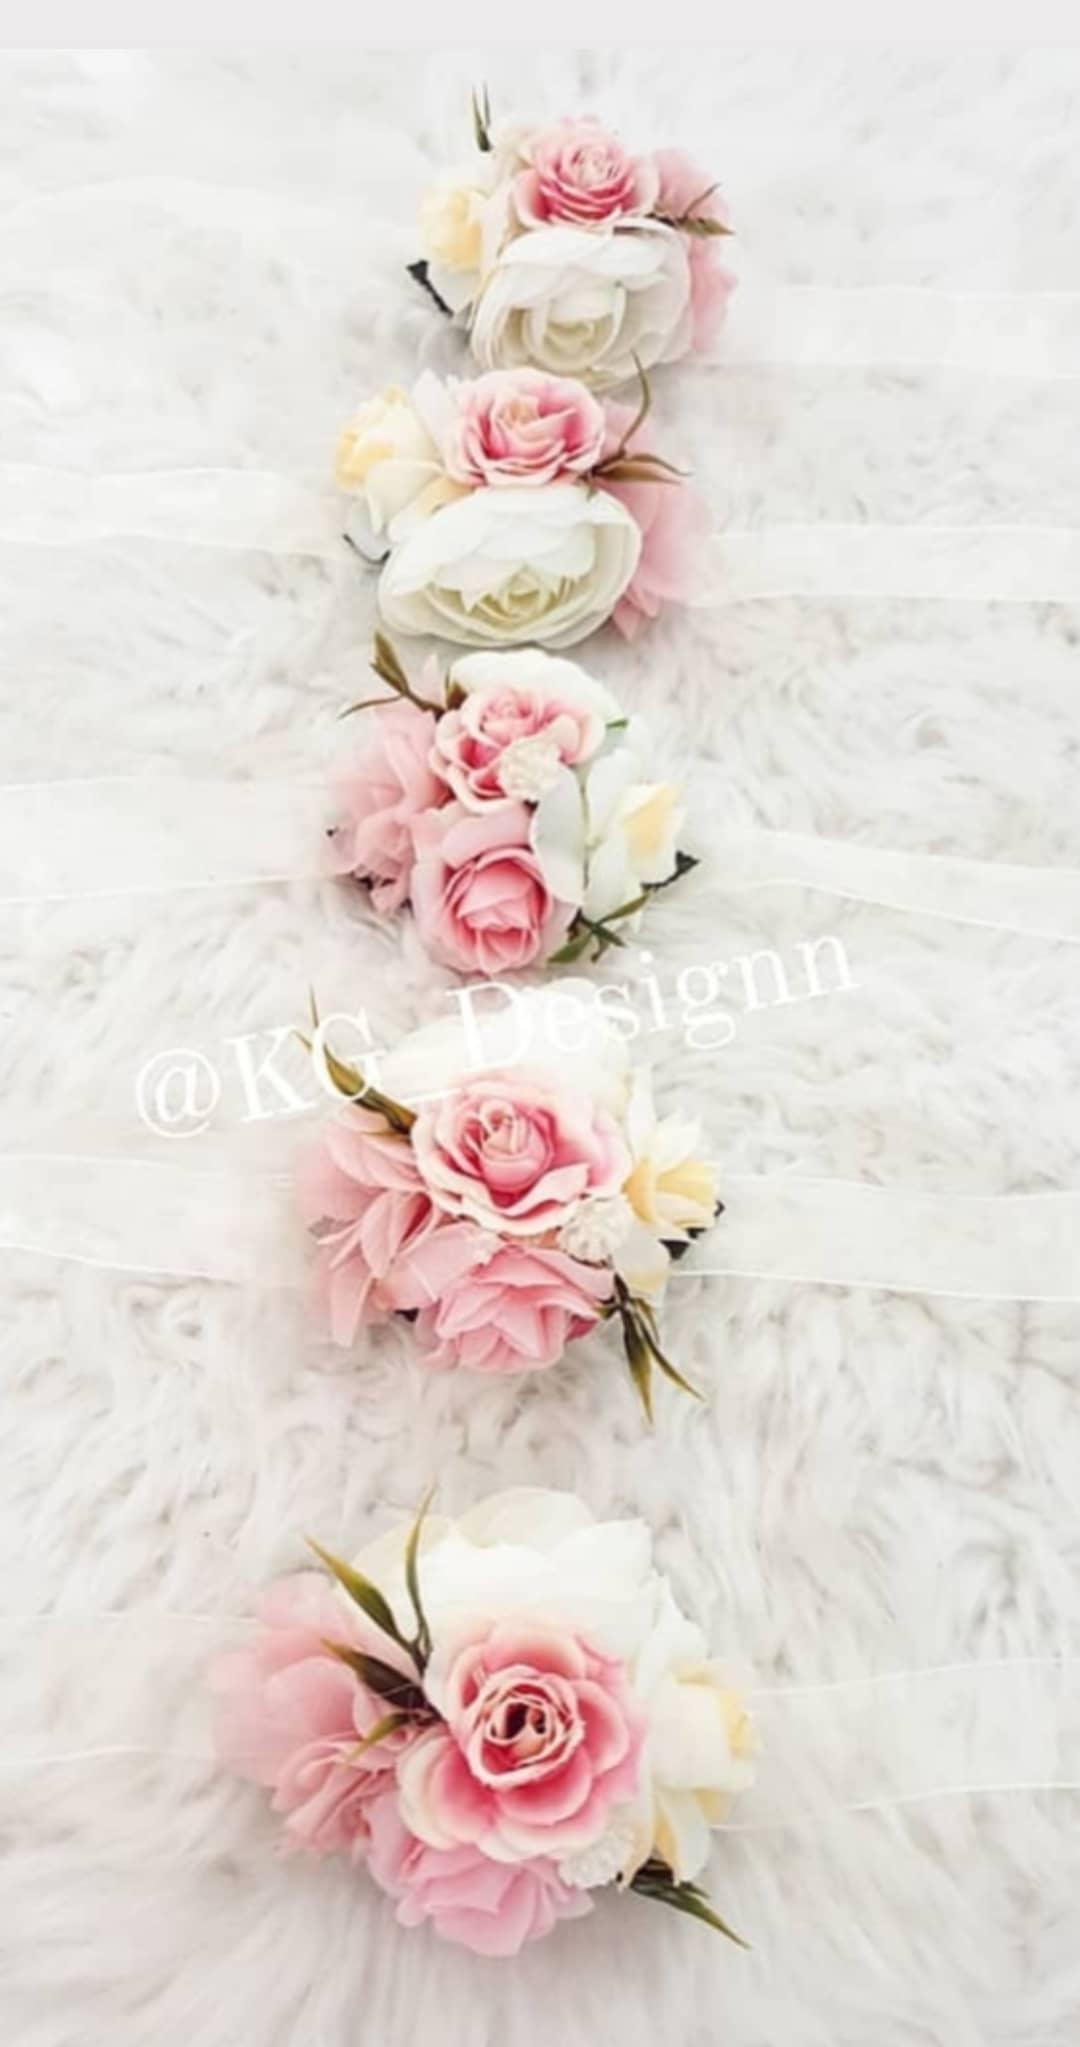 Bracelet rose nude blanc - KG DESIGNN